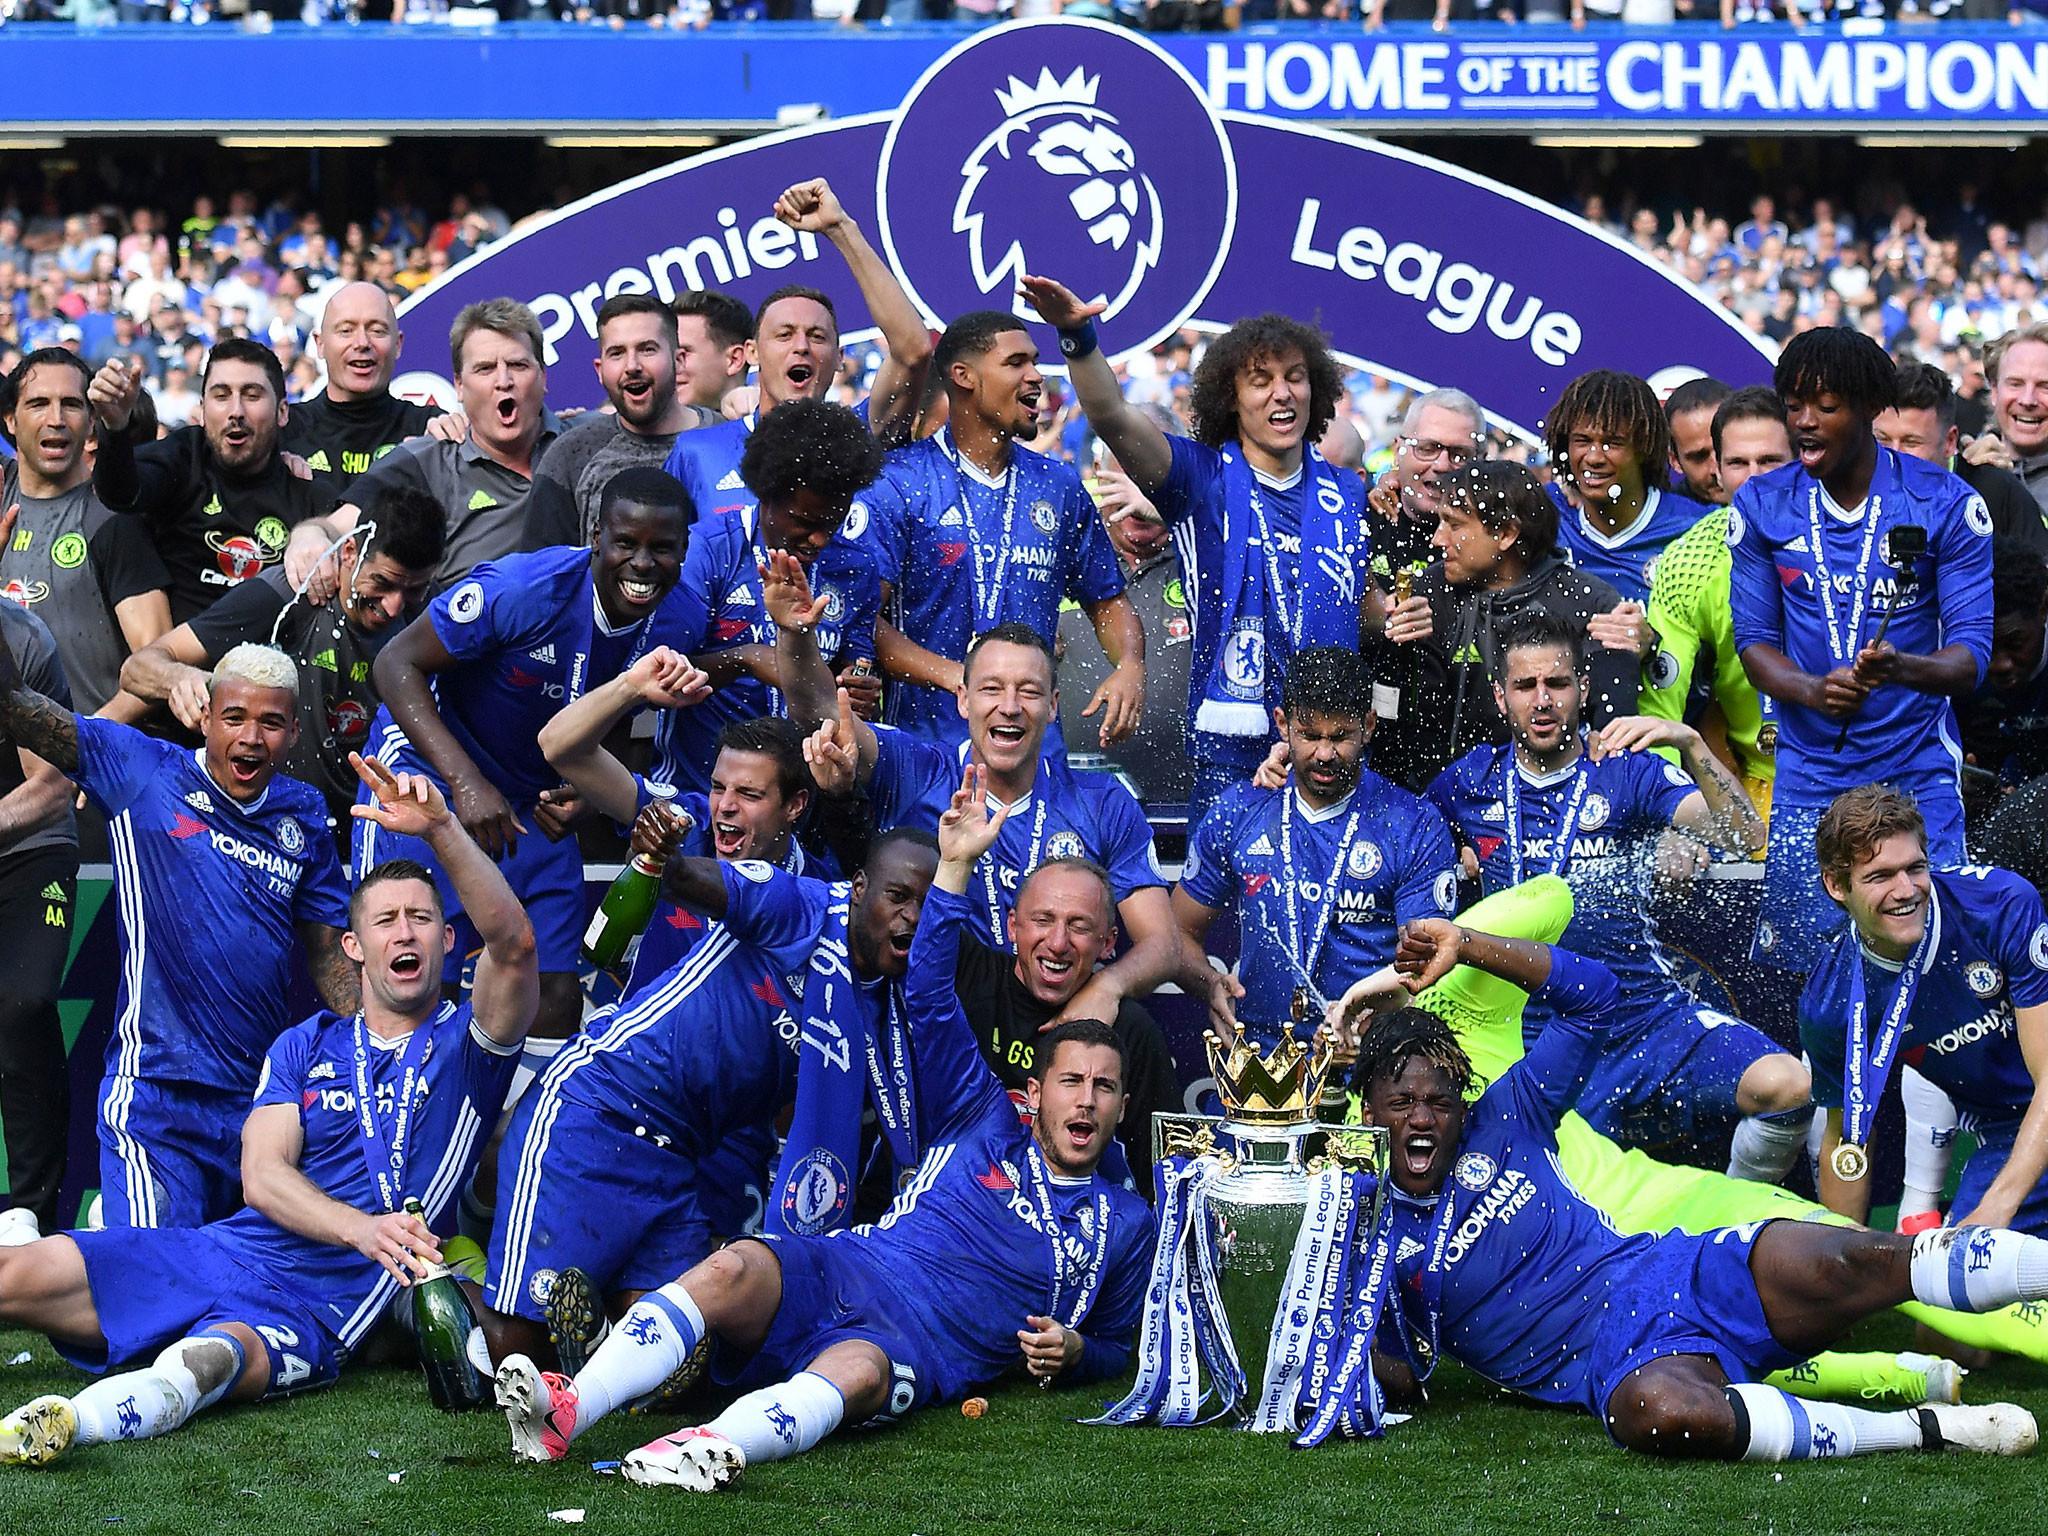 Chelsea 2018 Wallpaper 71 Images